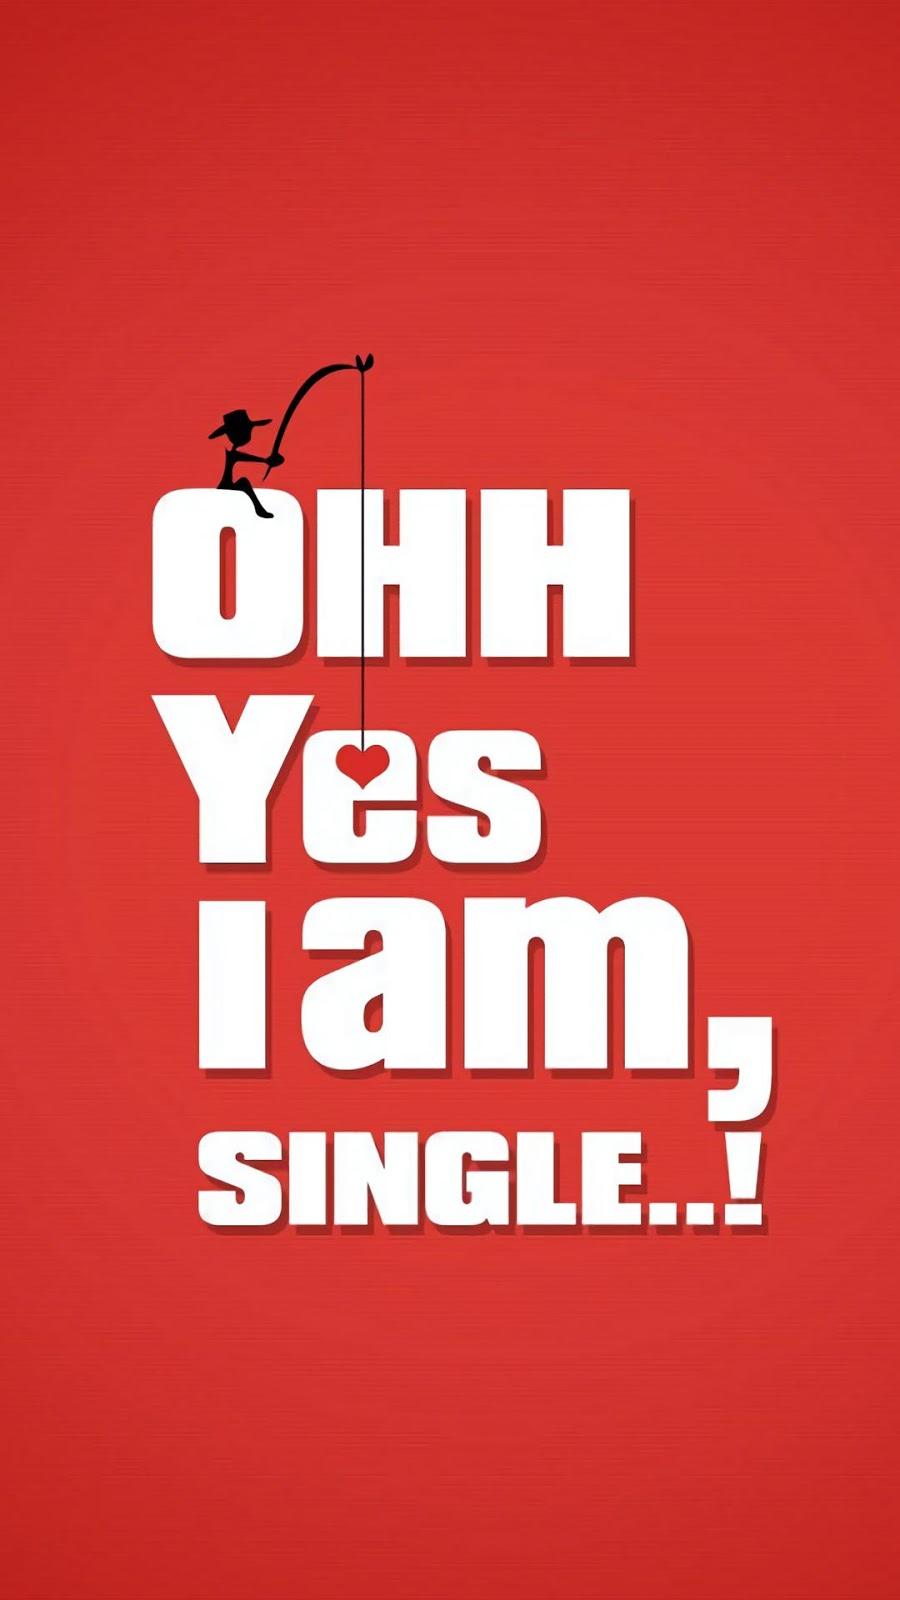 I am Single mobile wallpaper